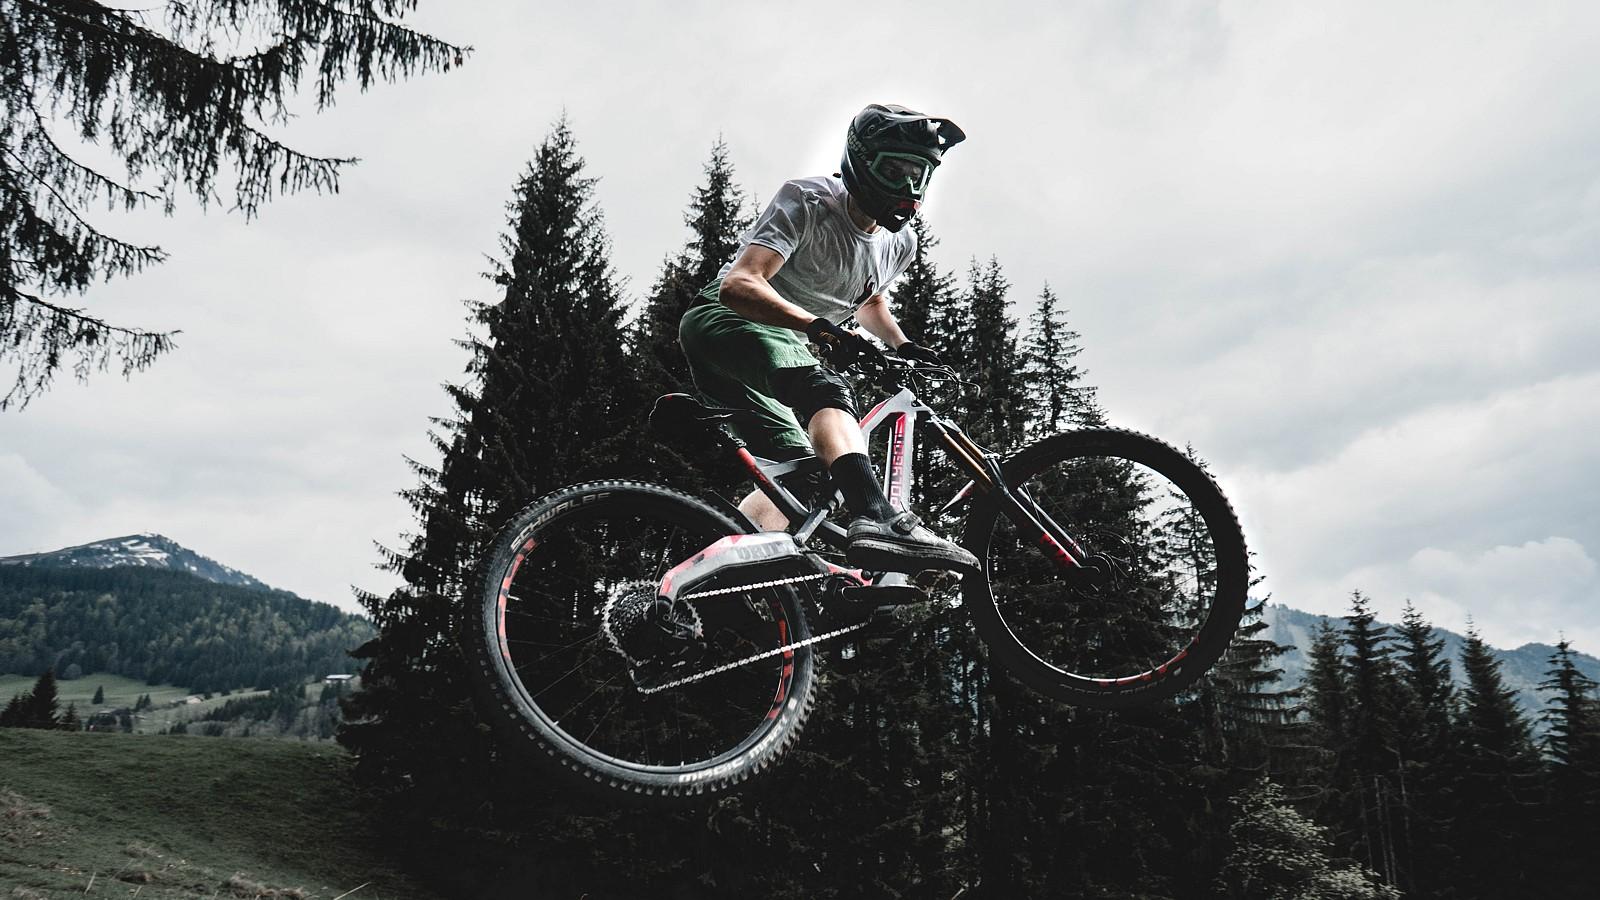 DSC01893 - Mushrum - Mountain Biking Pictures - Vital MTB